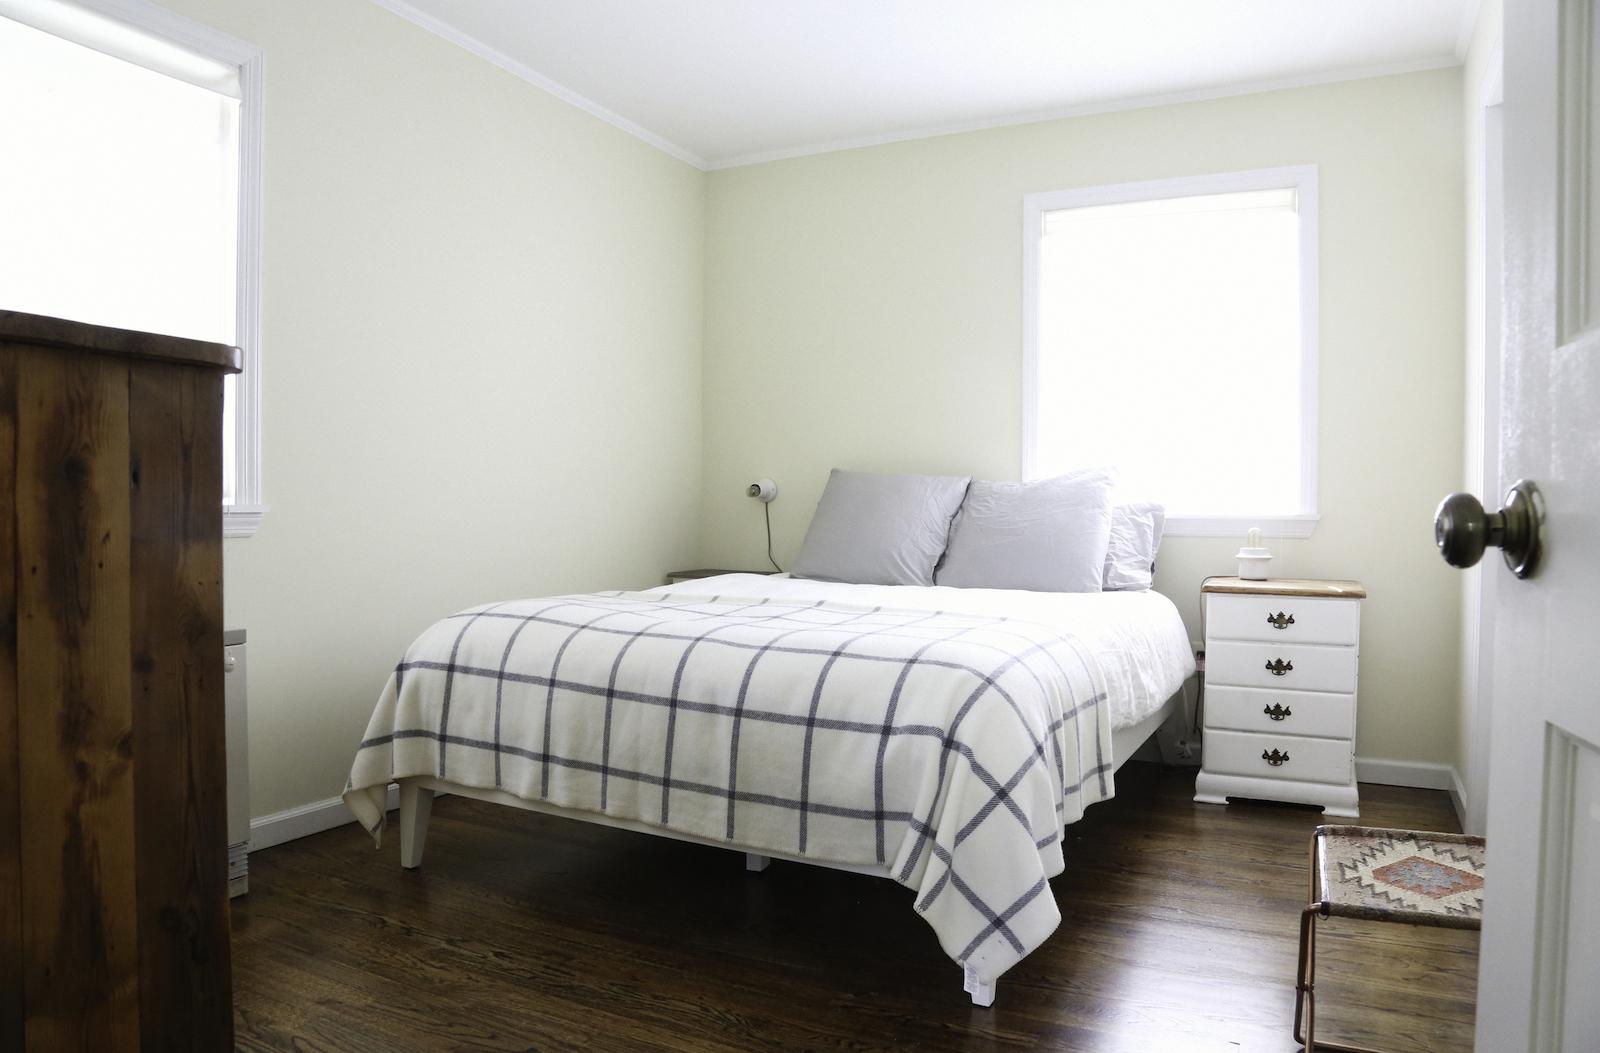 HUBERT HOUSE BEDROOM TWO 1.jpg